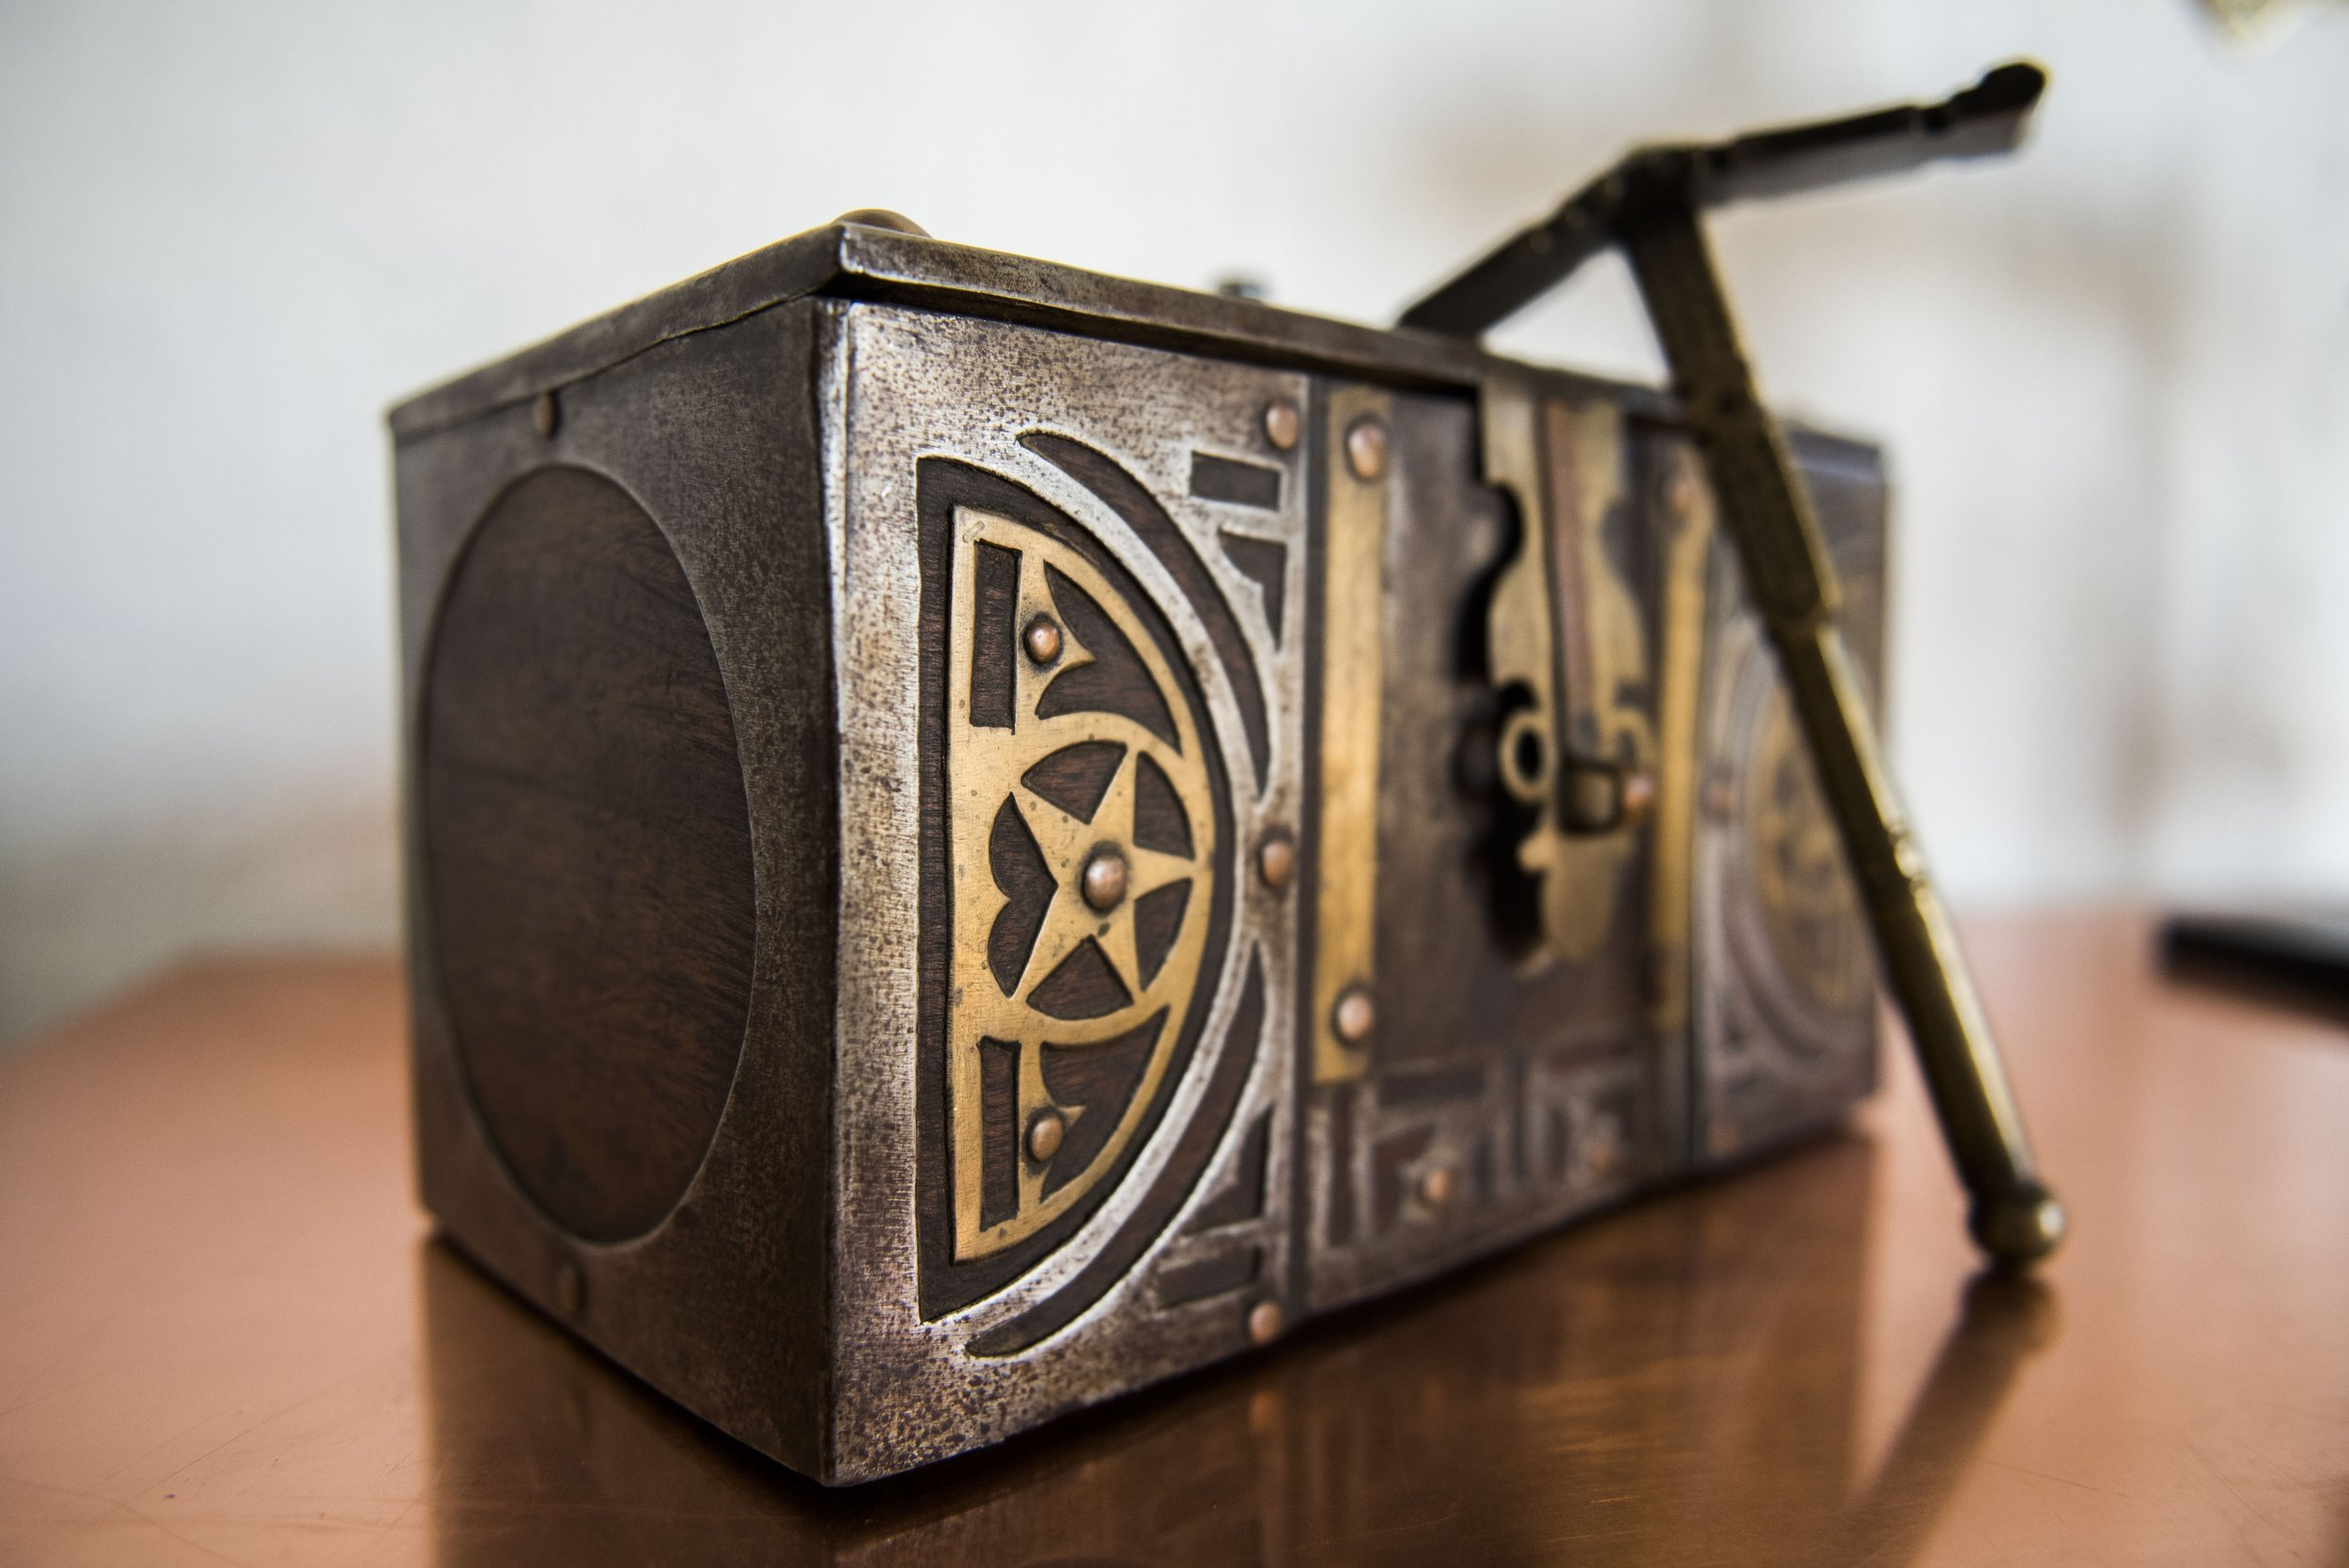 19th century Tuareg Tea Box, YSWARA Tearoom Private Collection